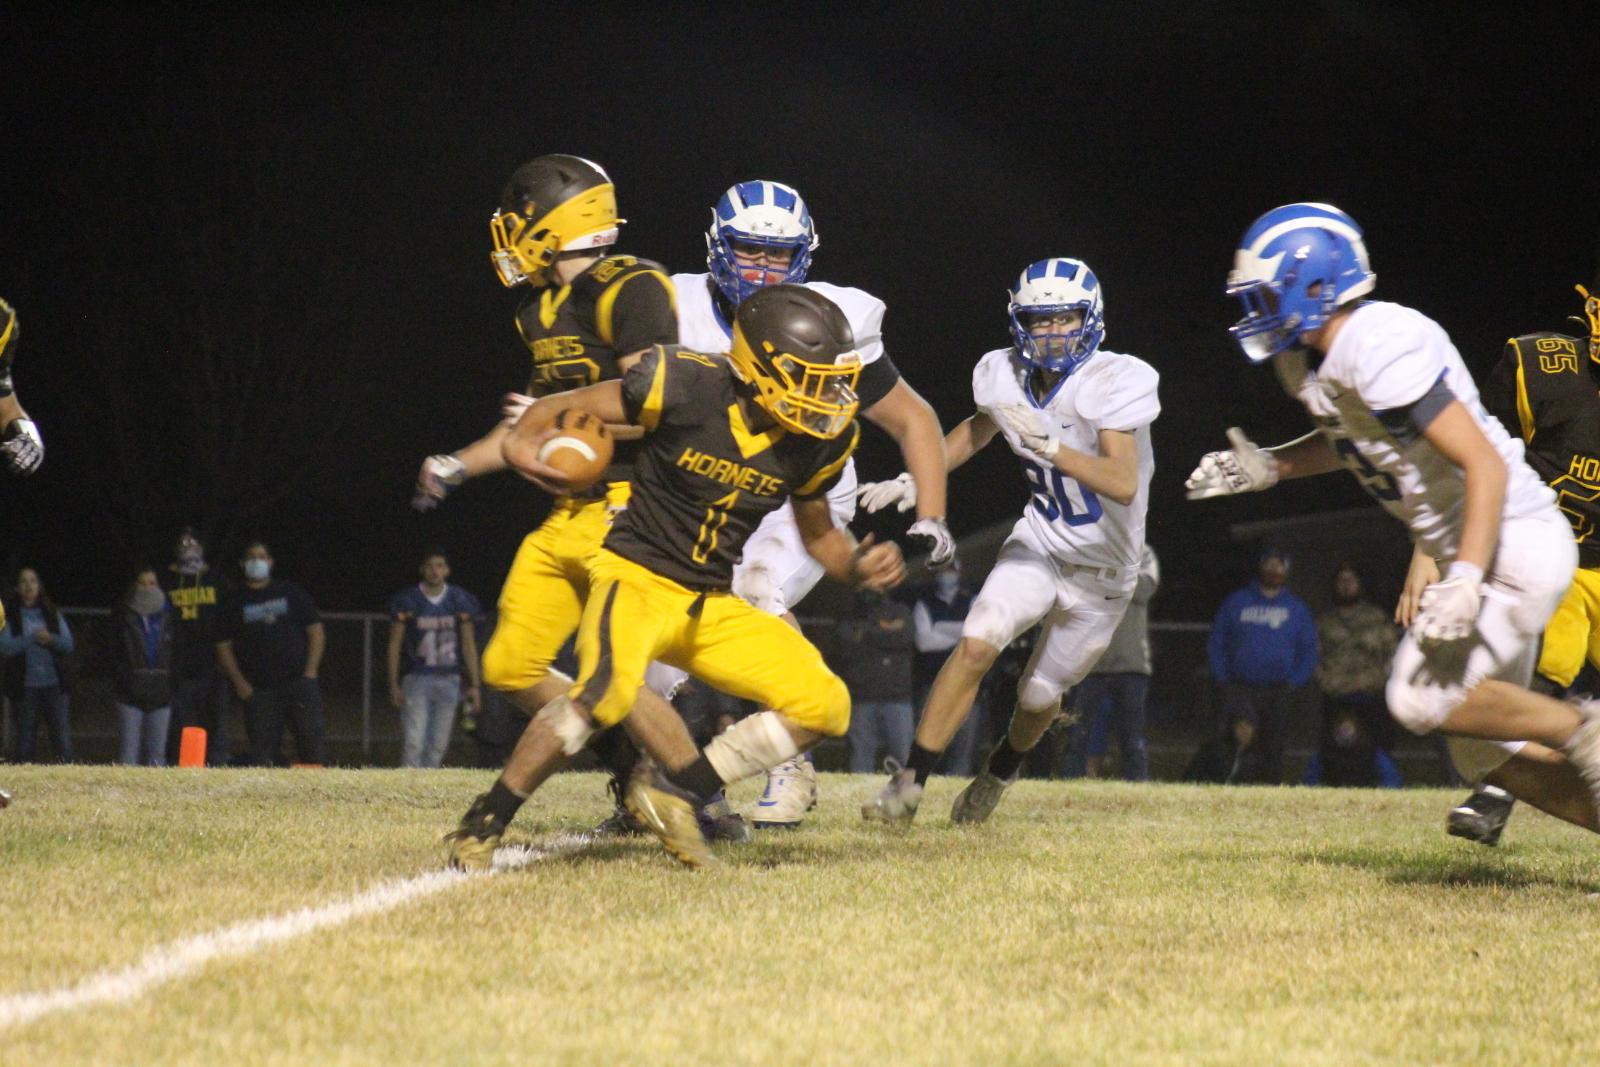 Photos: Football vs Inland Lakes Playoffs 11/6/20